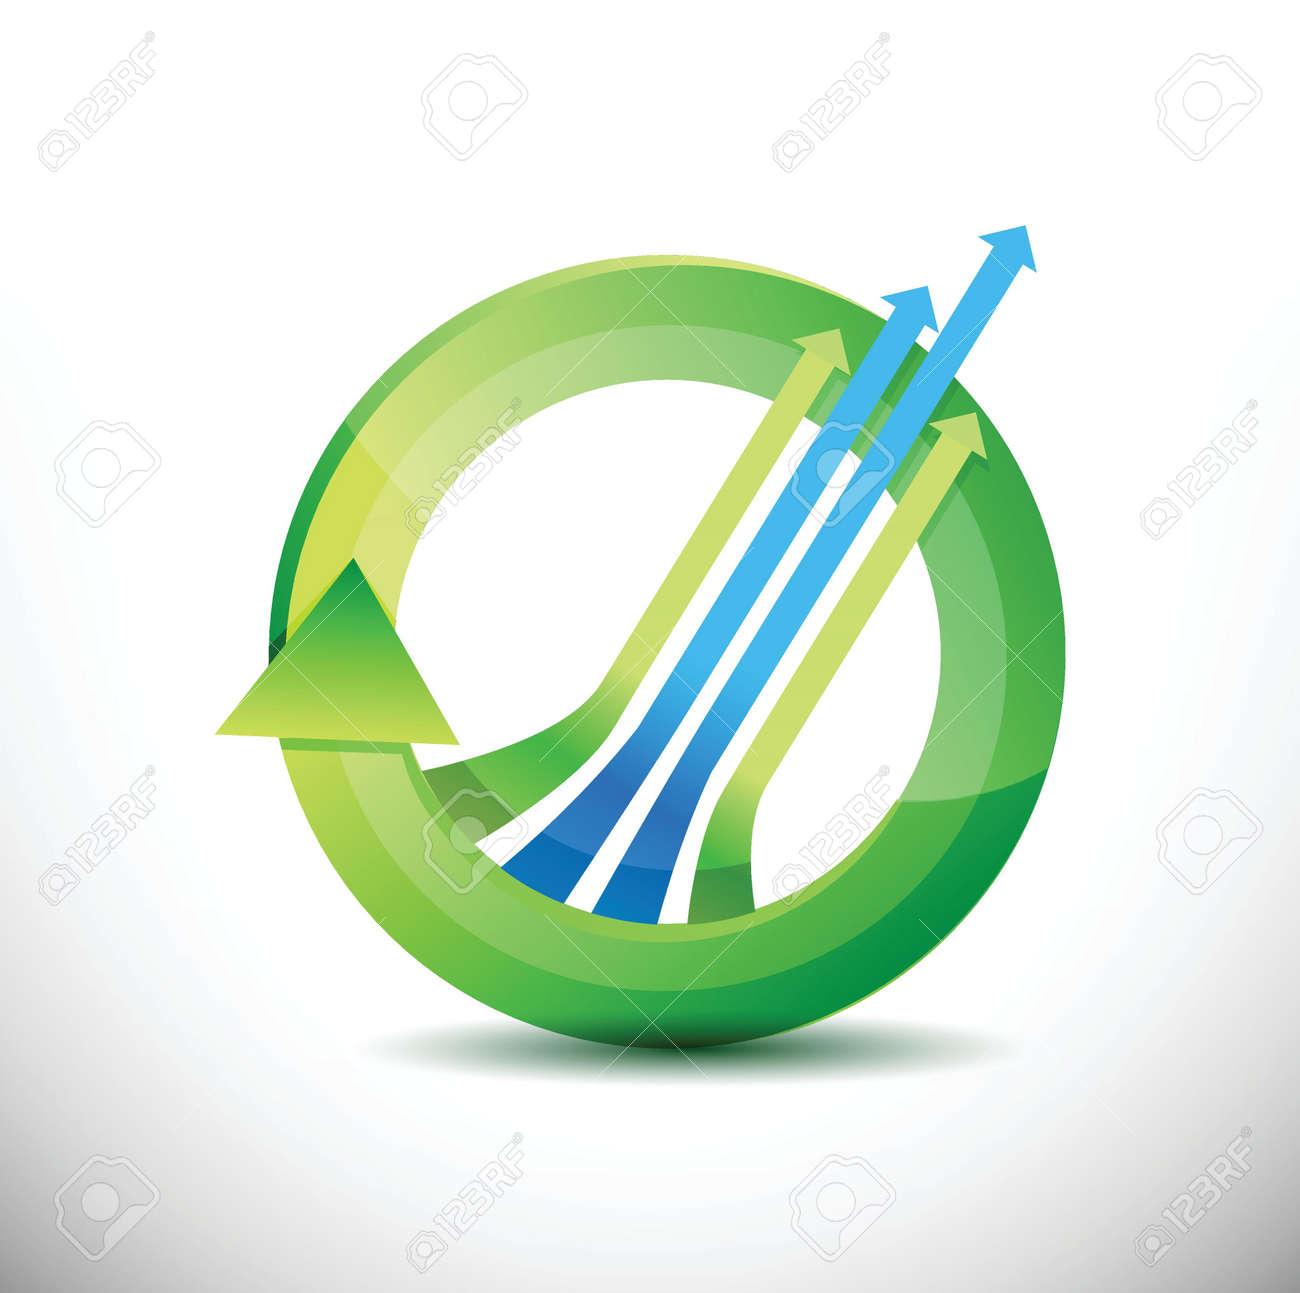 leader arrow 360 design concept illustration design over white Stock Vector - 20046720